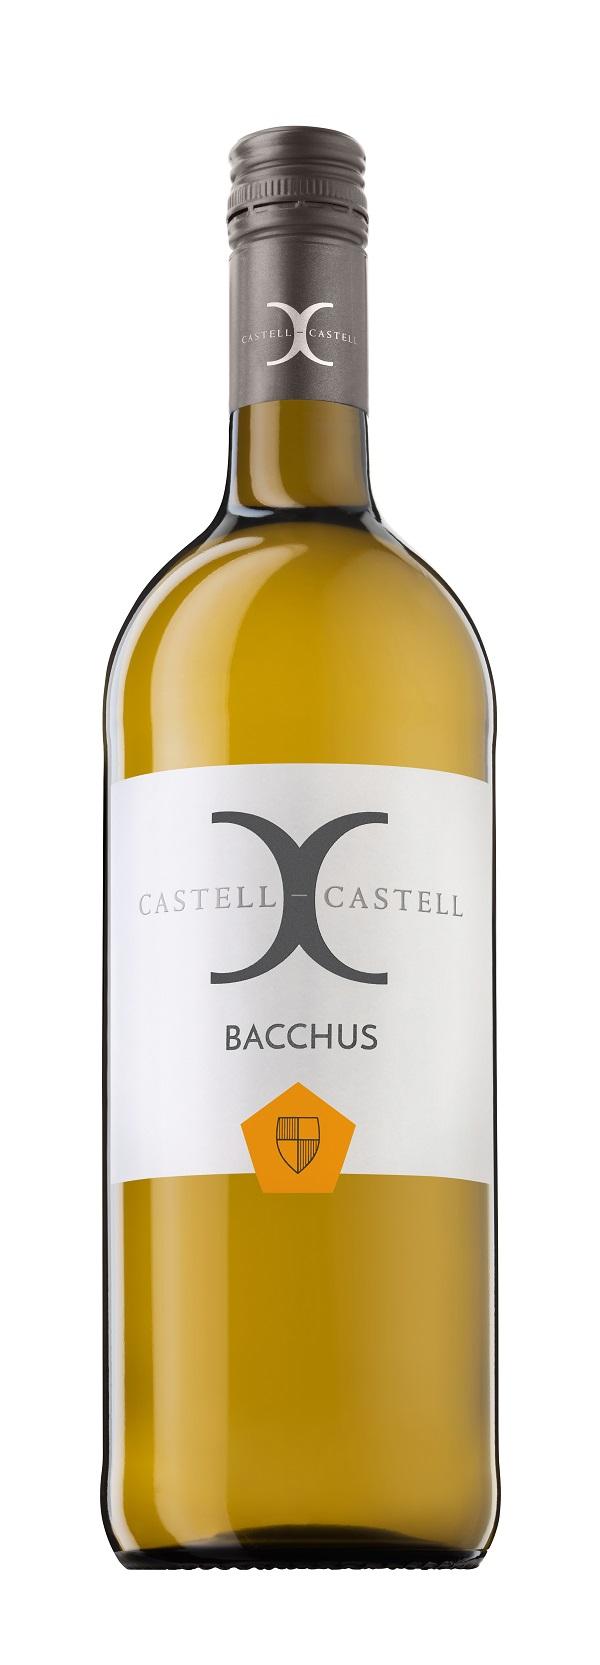 CASTELL-CASTELL Bacchus 2021